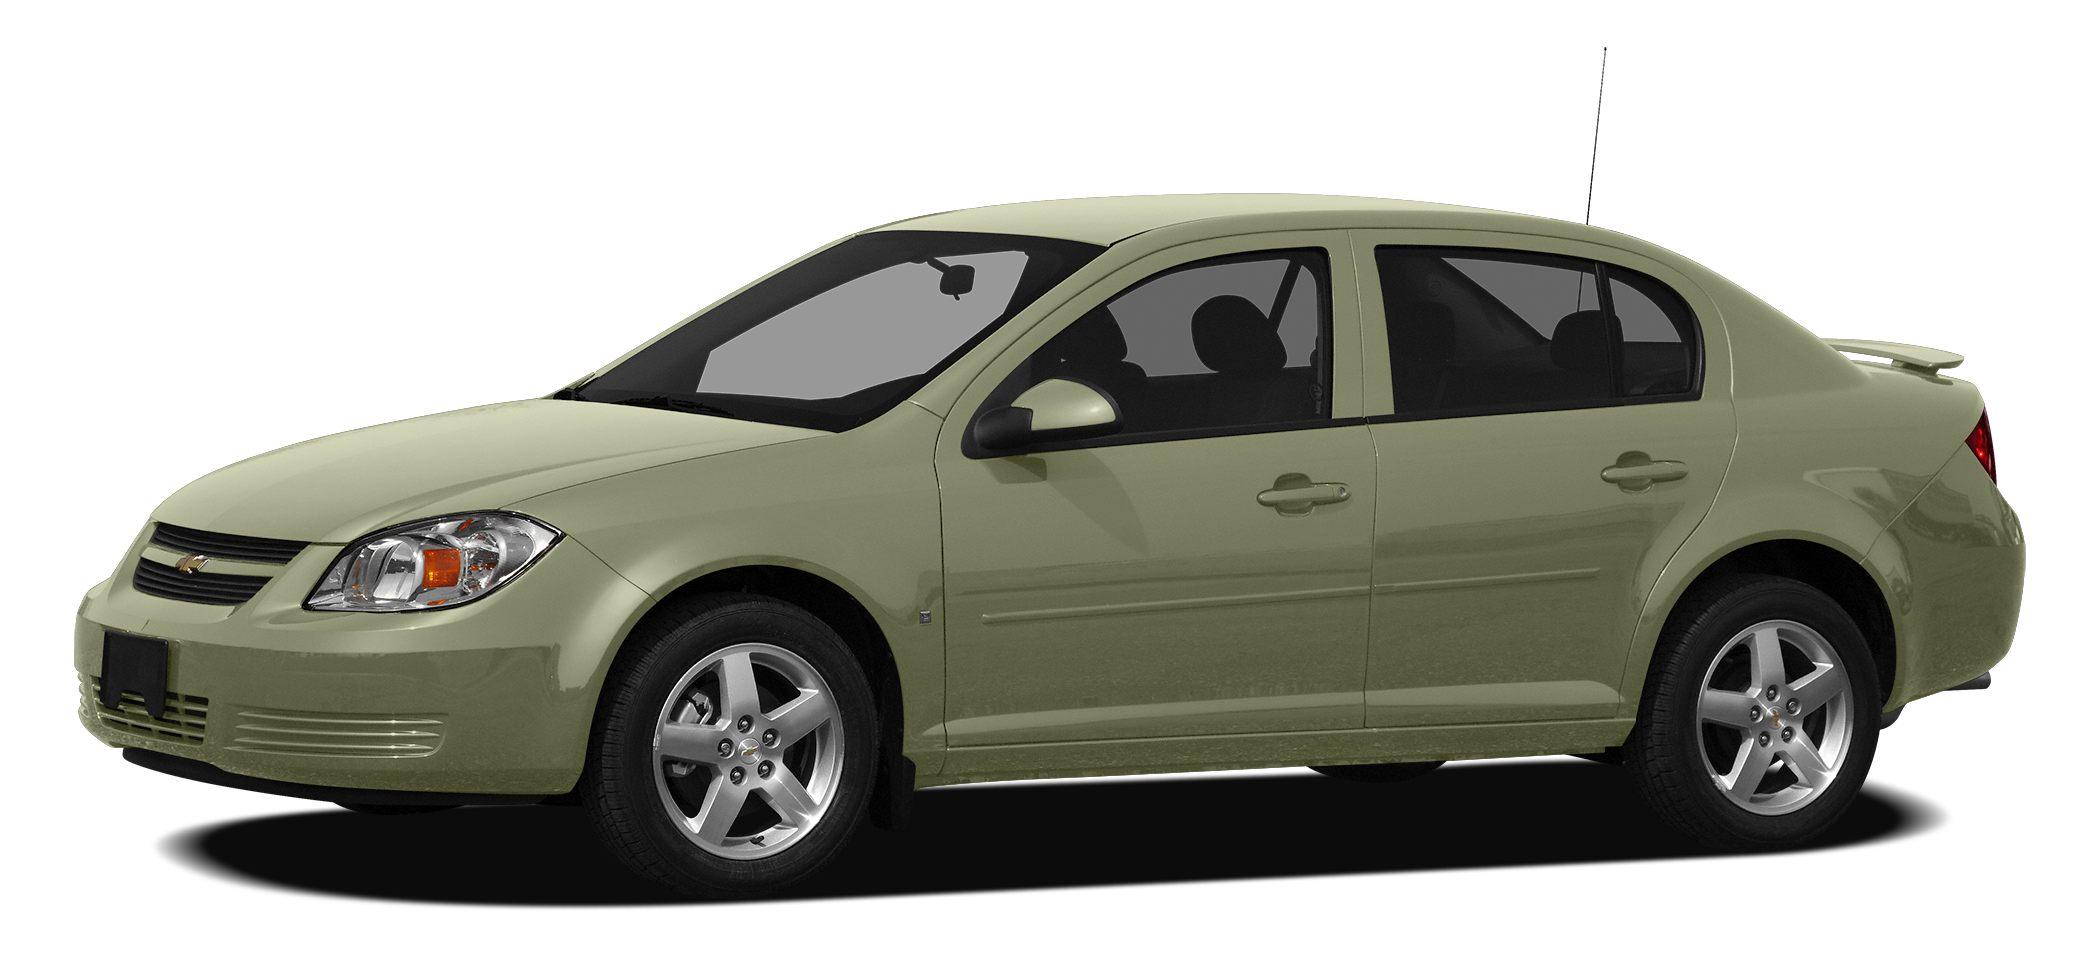 2010 Chevrolet Cobalt LT PRICED TO MOVE 1700 below NADA Retail EPA 35 MPG Hwy25 MPG City ONL